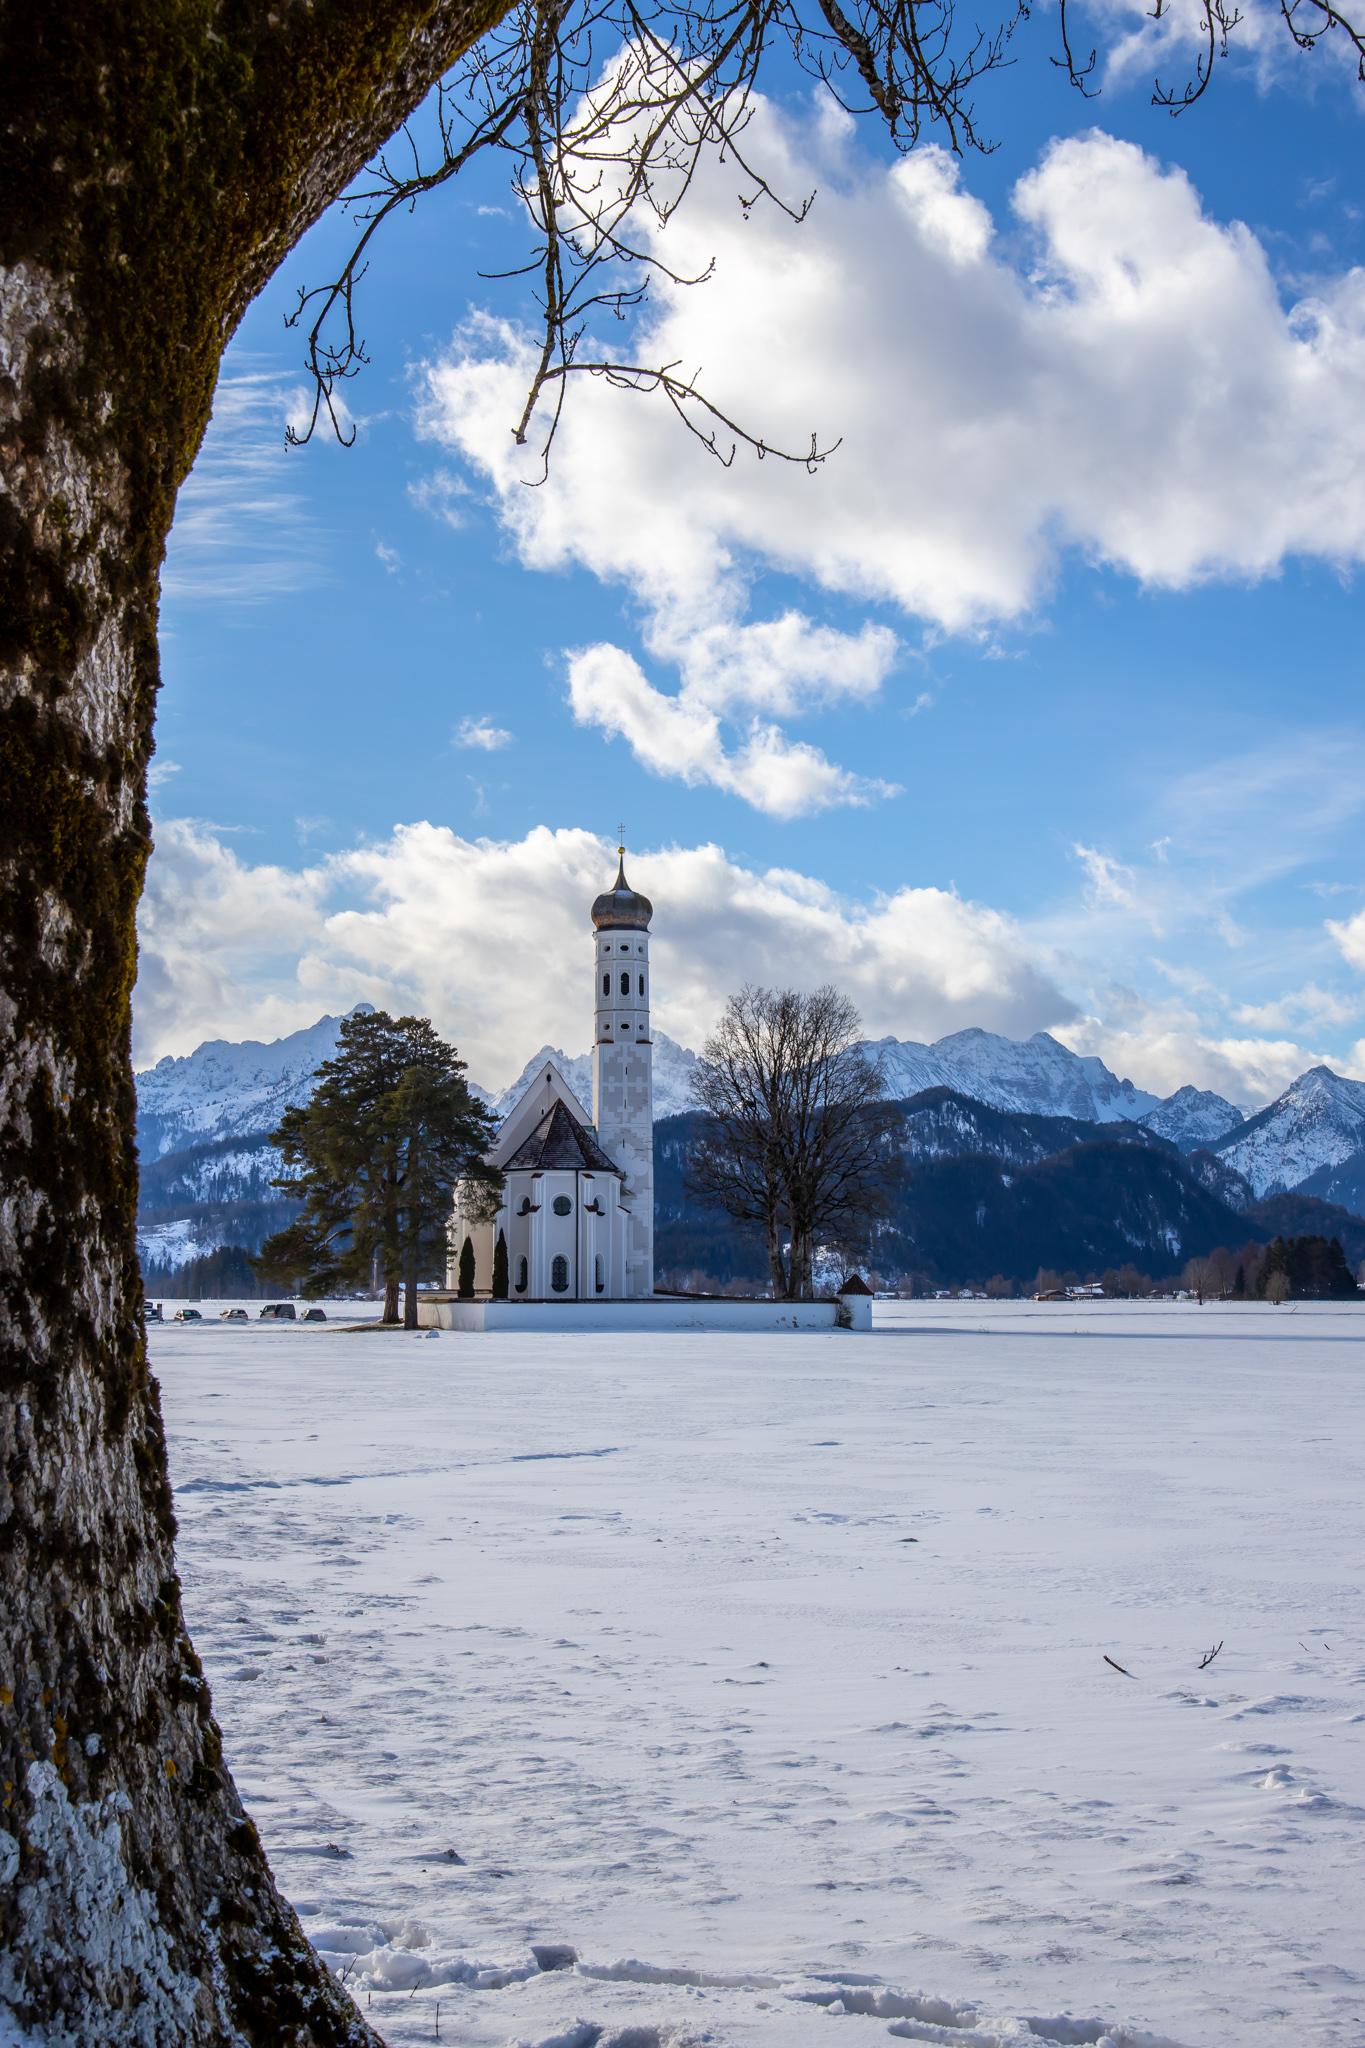 St. Coloman - Schwangau